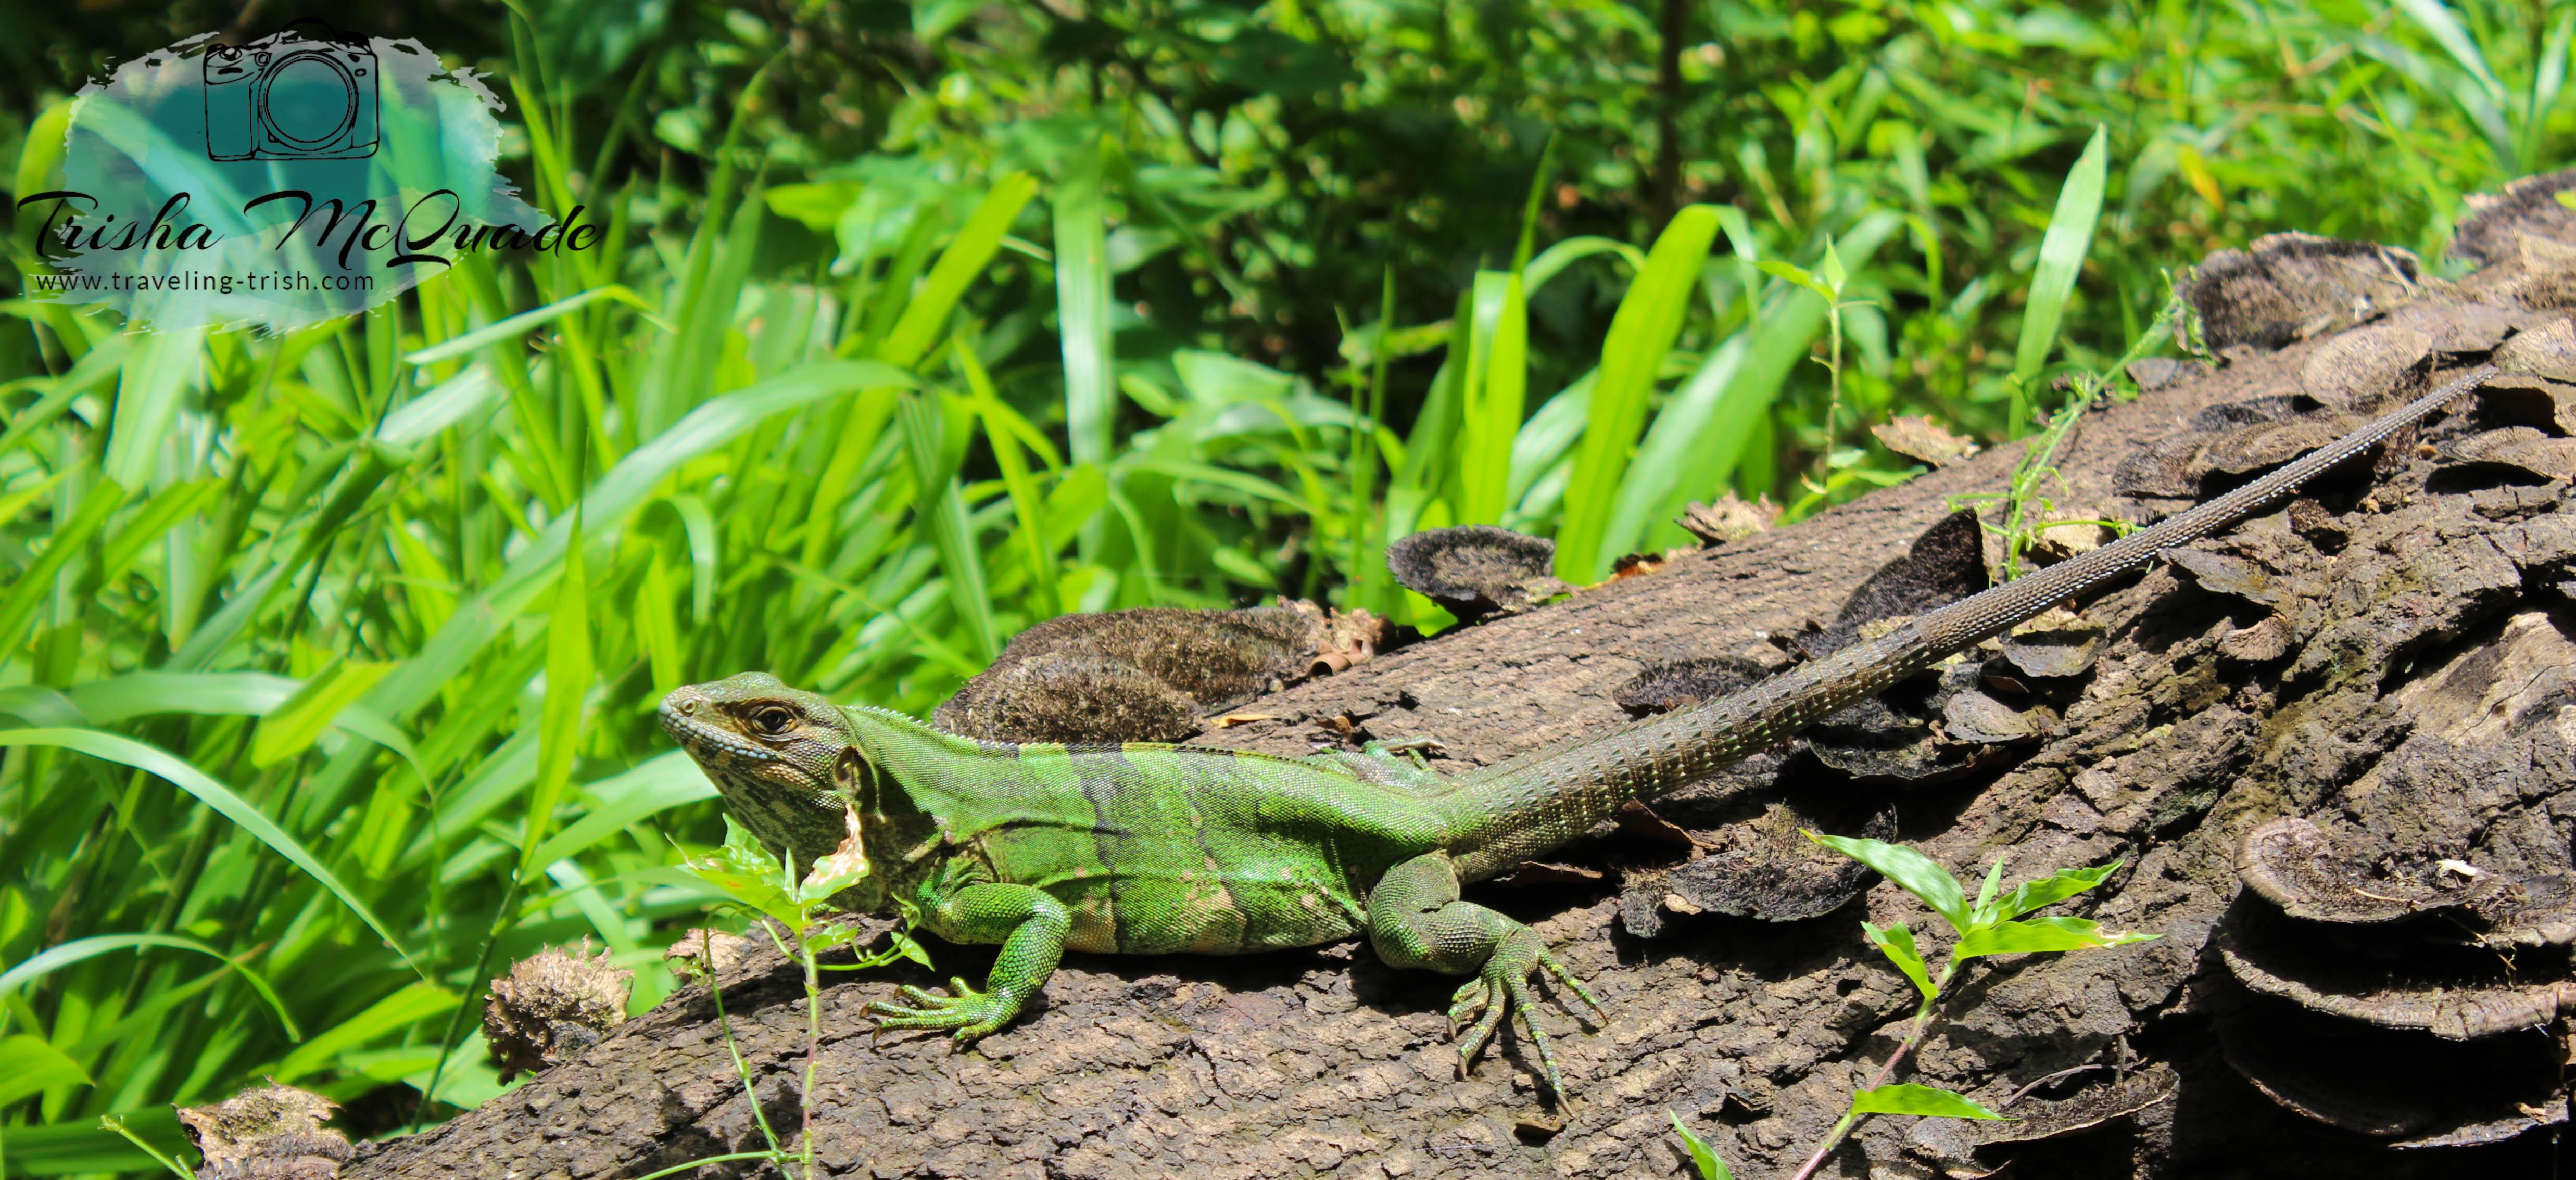 Iguana Chill